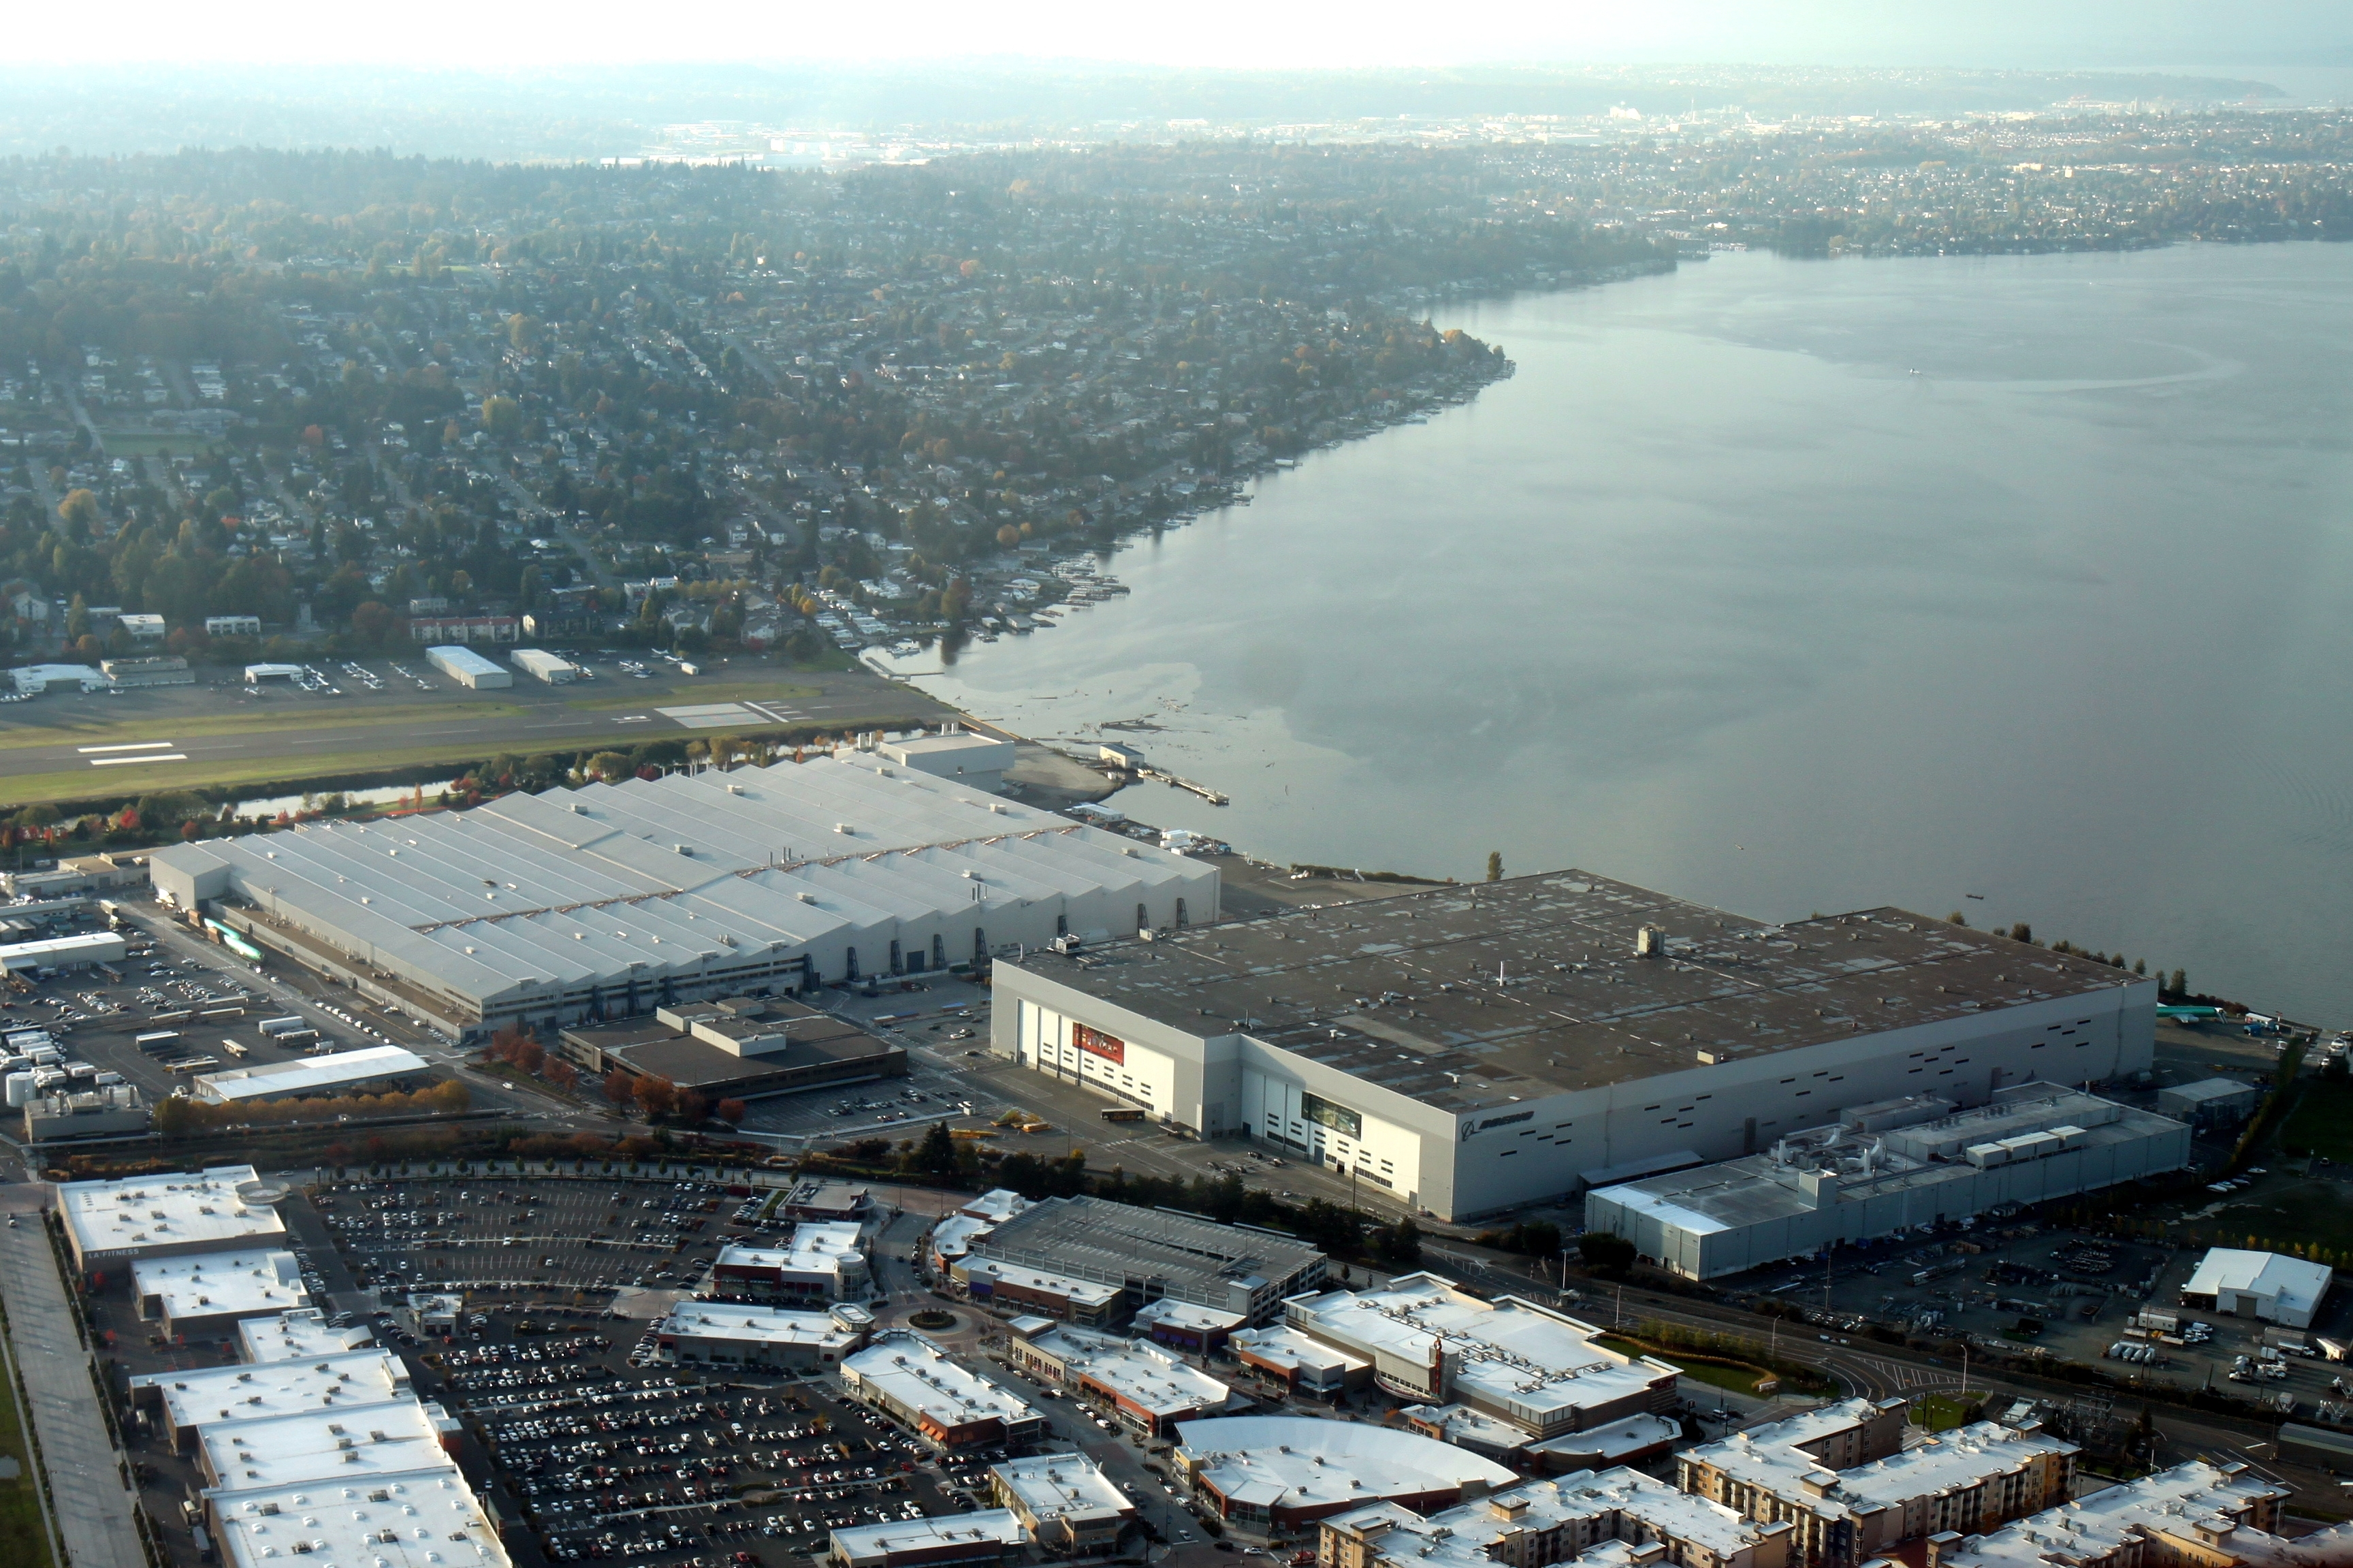 Boeing Renton Factory - Wikipedia in Boeing Renton Factory Map